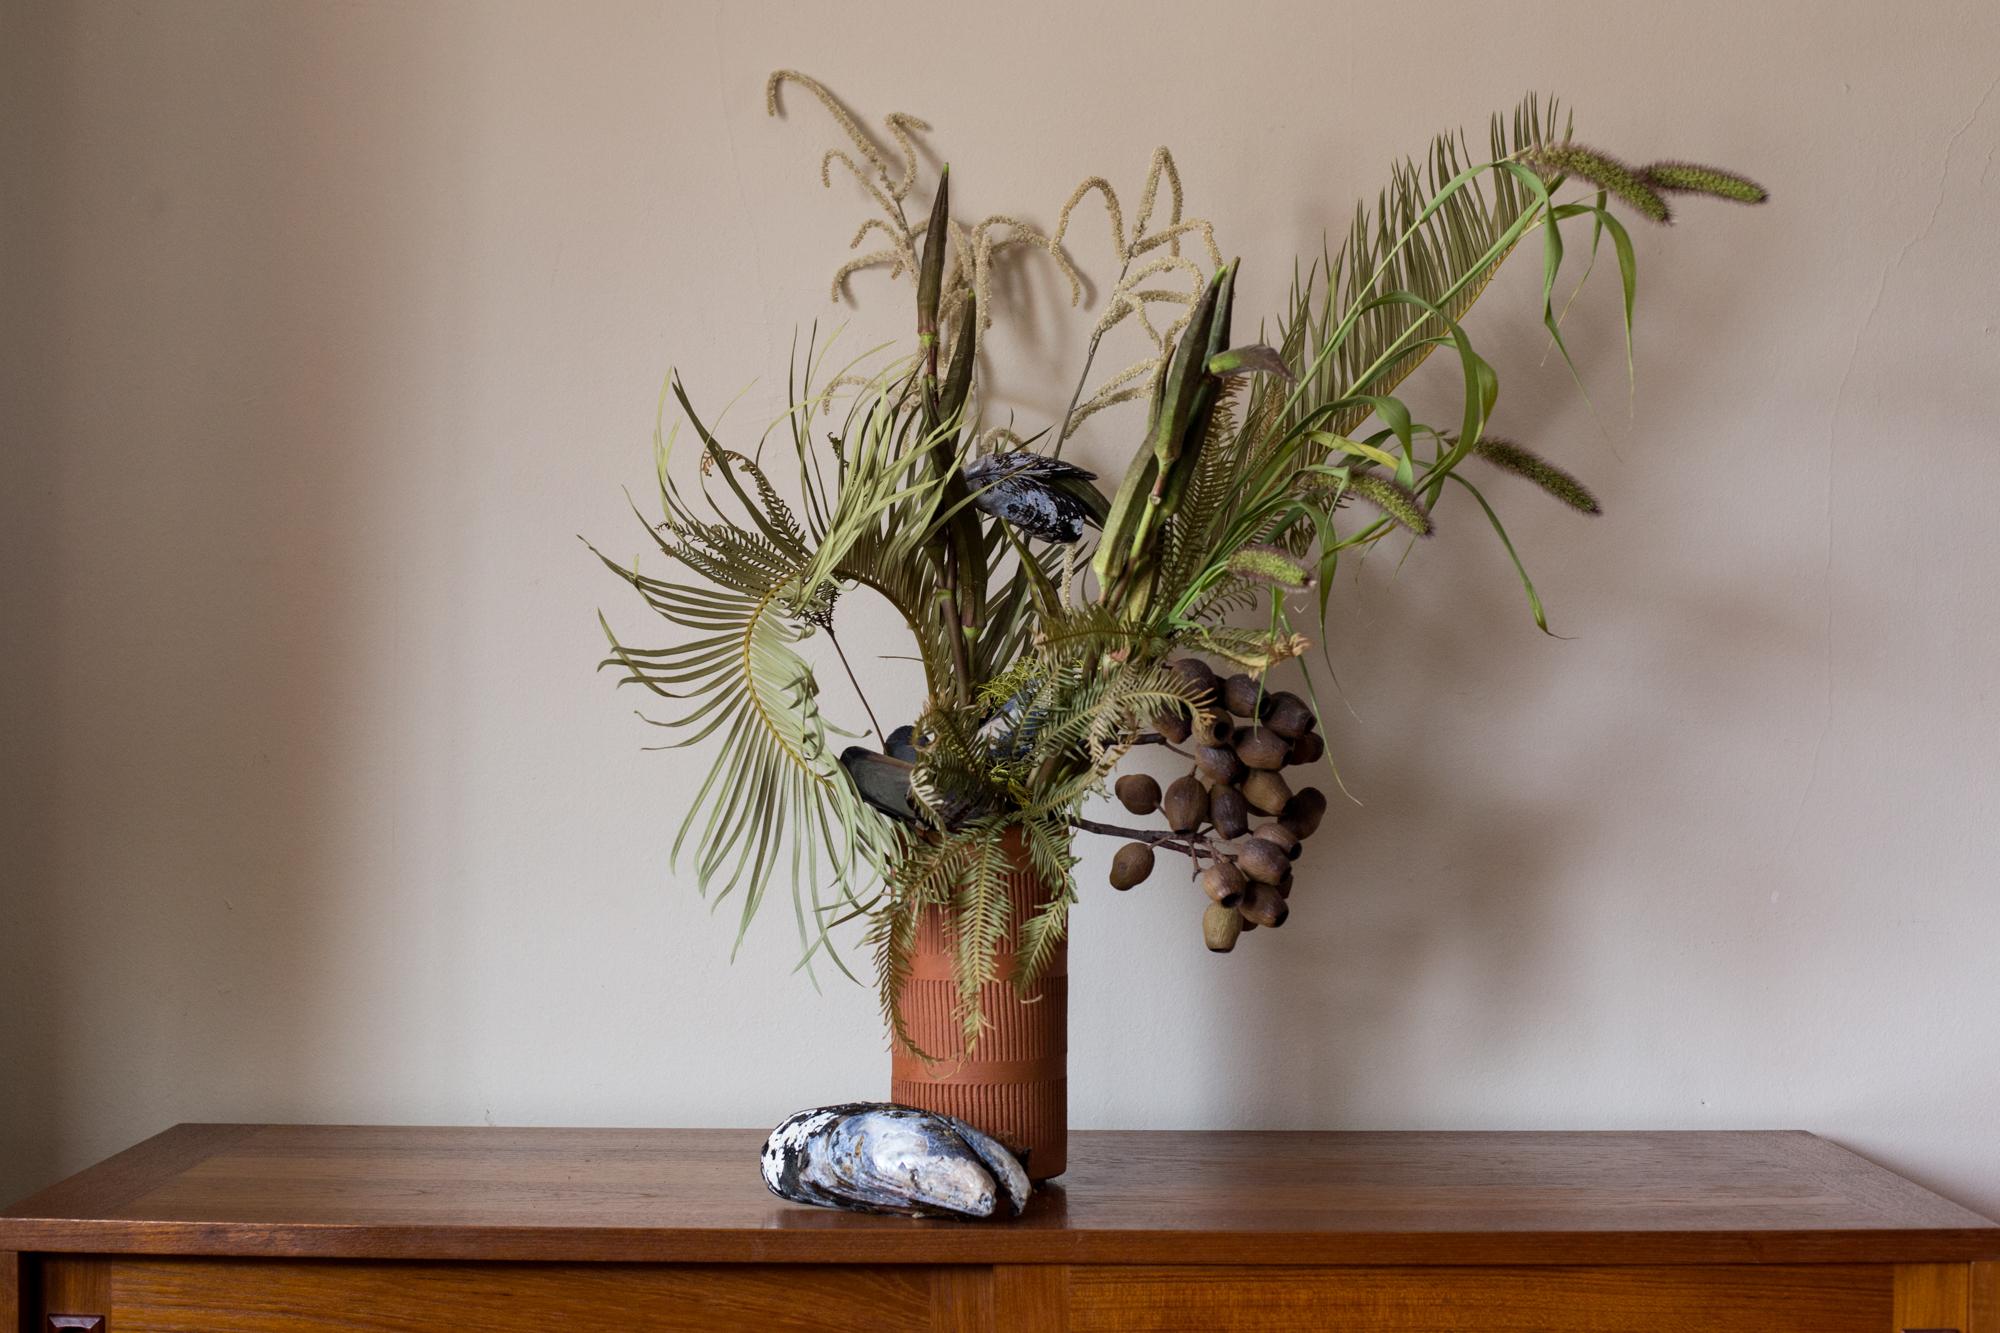 08232018-milkweed-9271.jpg